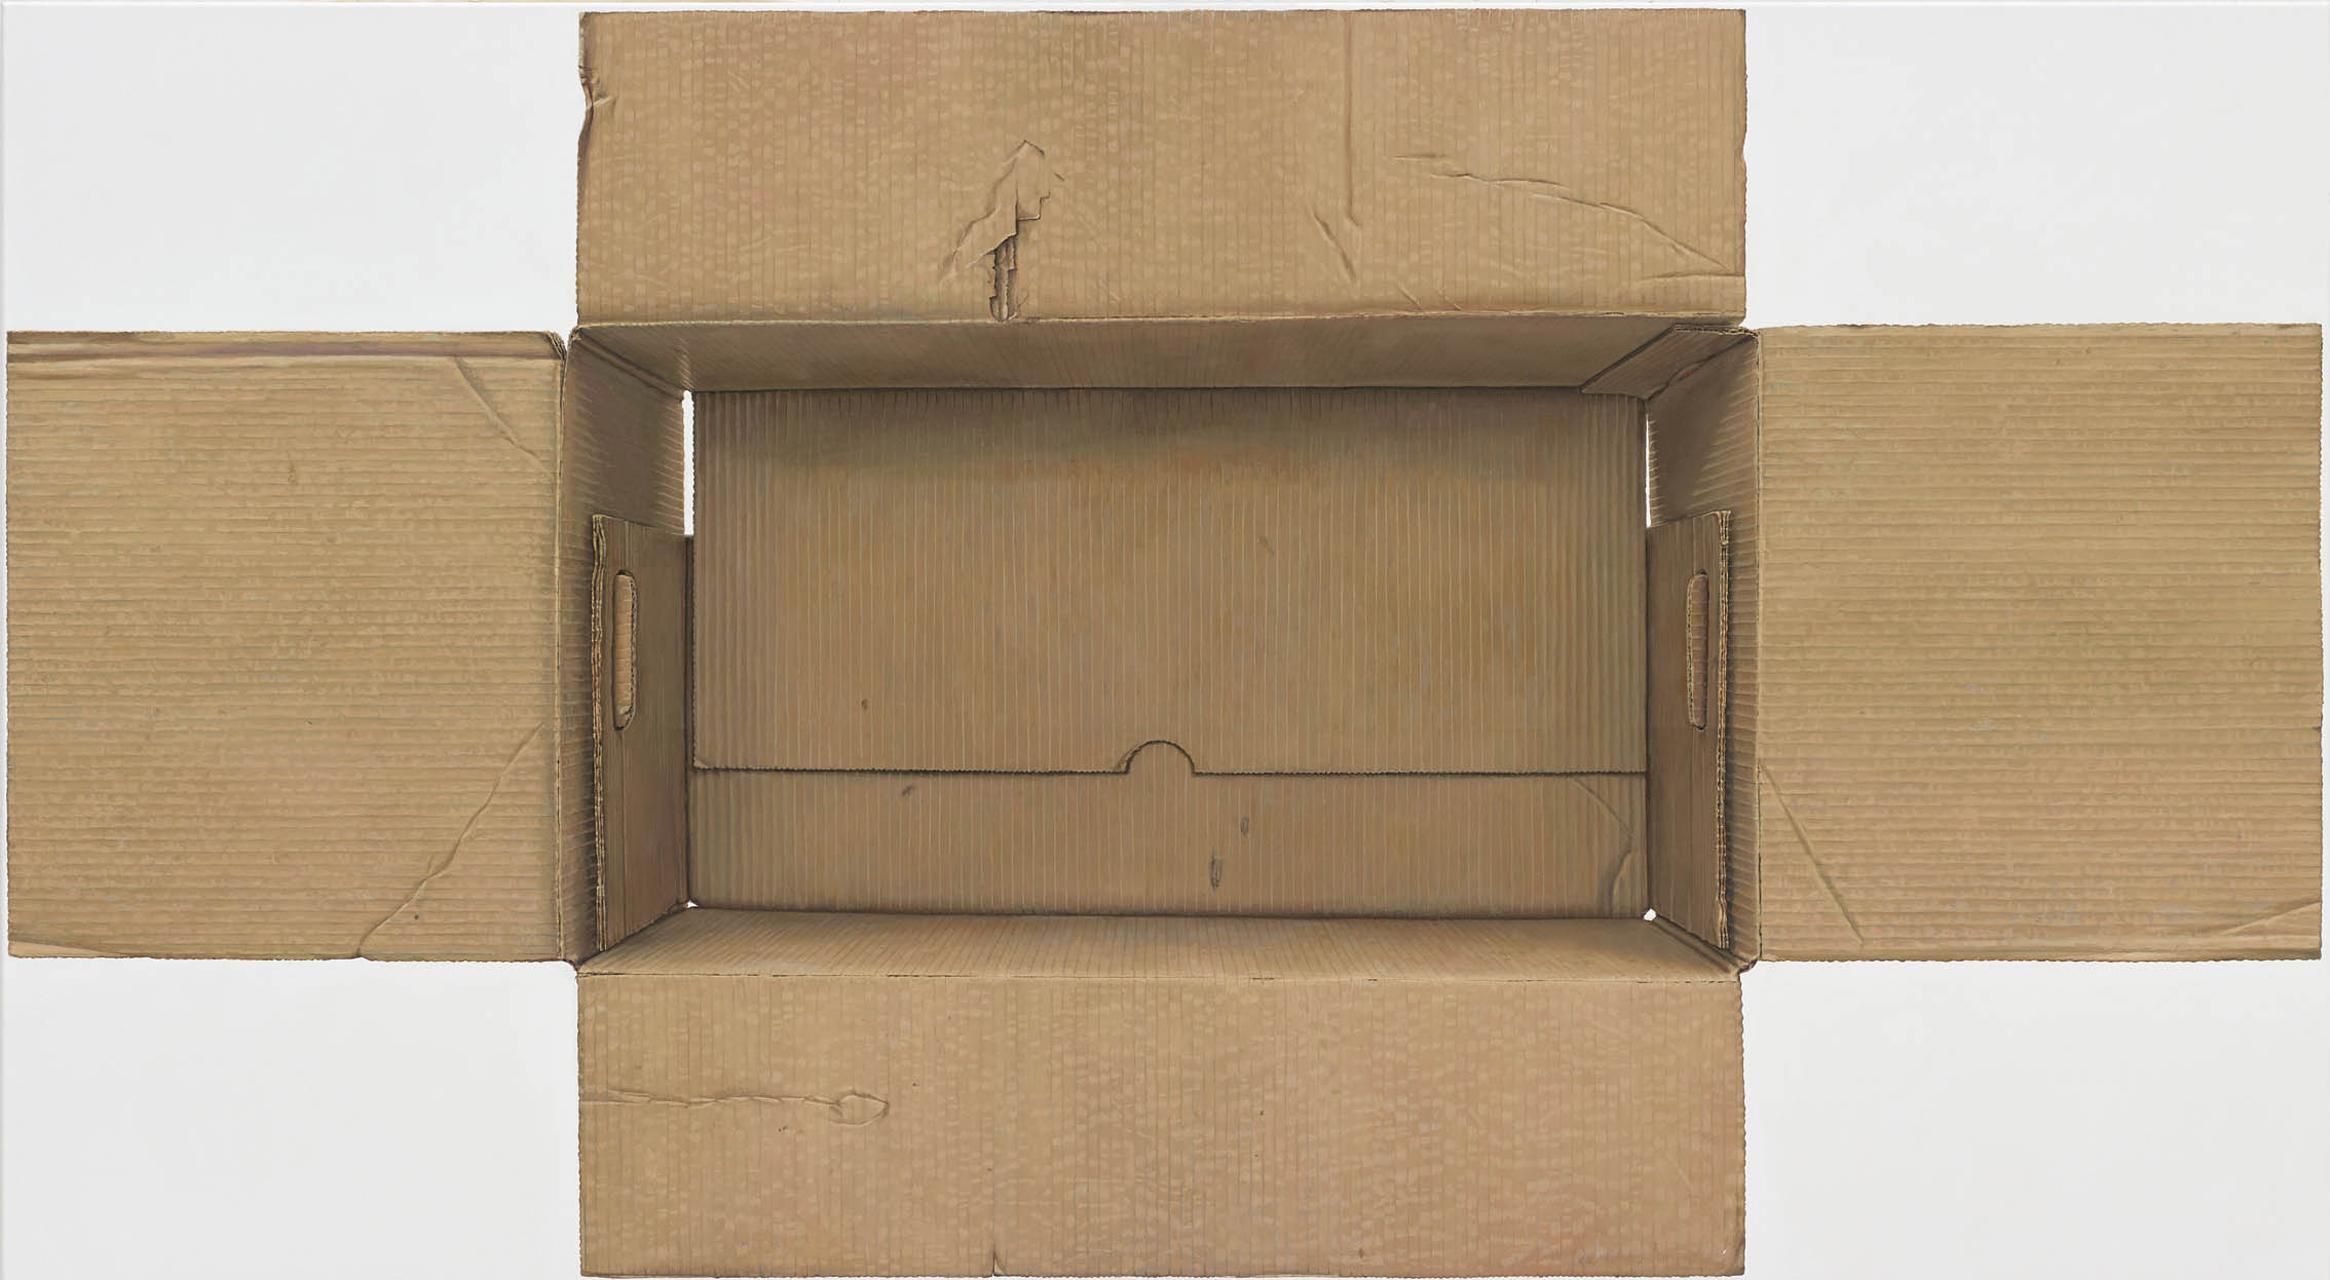 René Wirths, Karton, 2015, Öl auf Leinwand, 110 x 200 cm